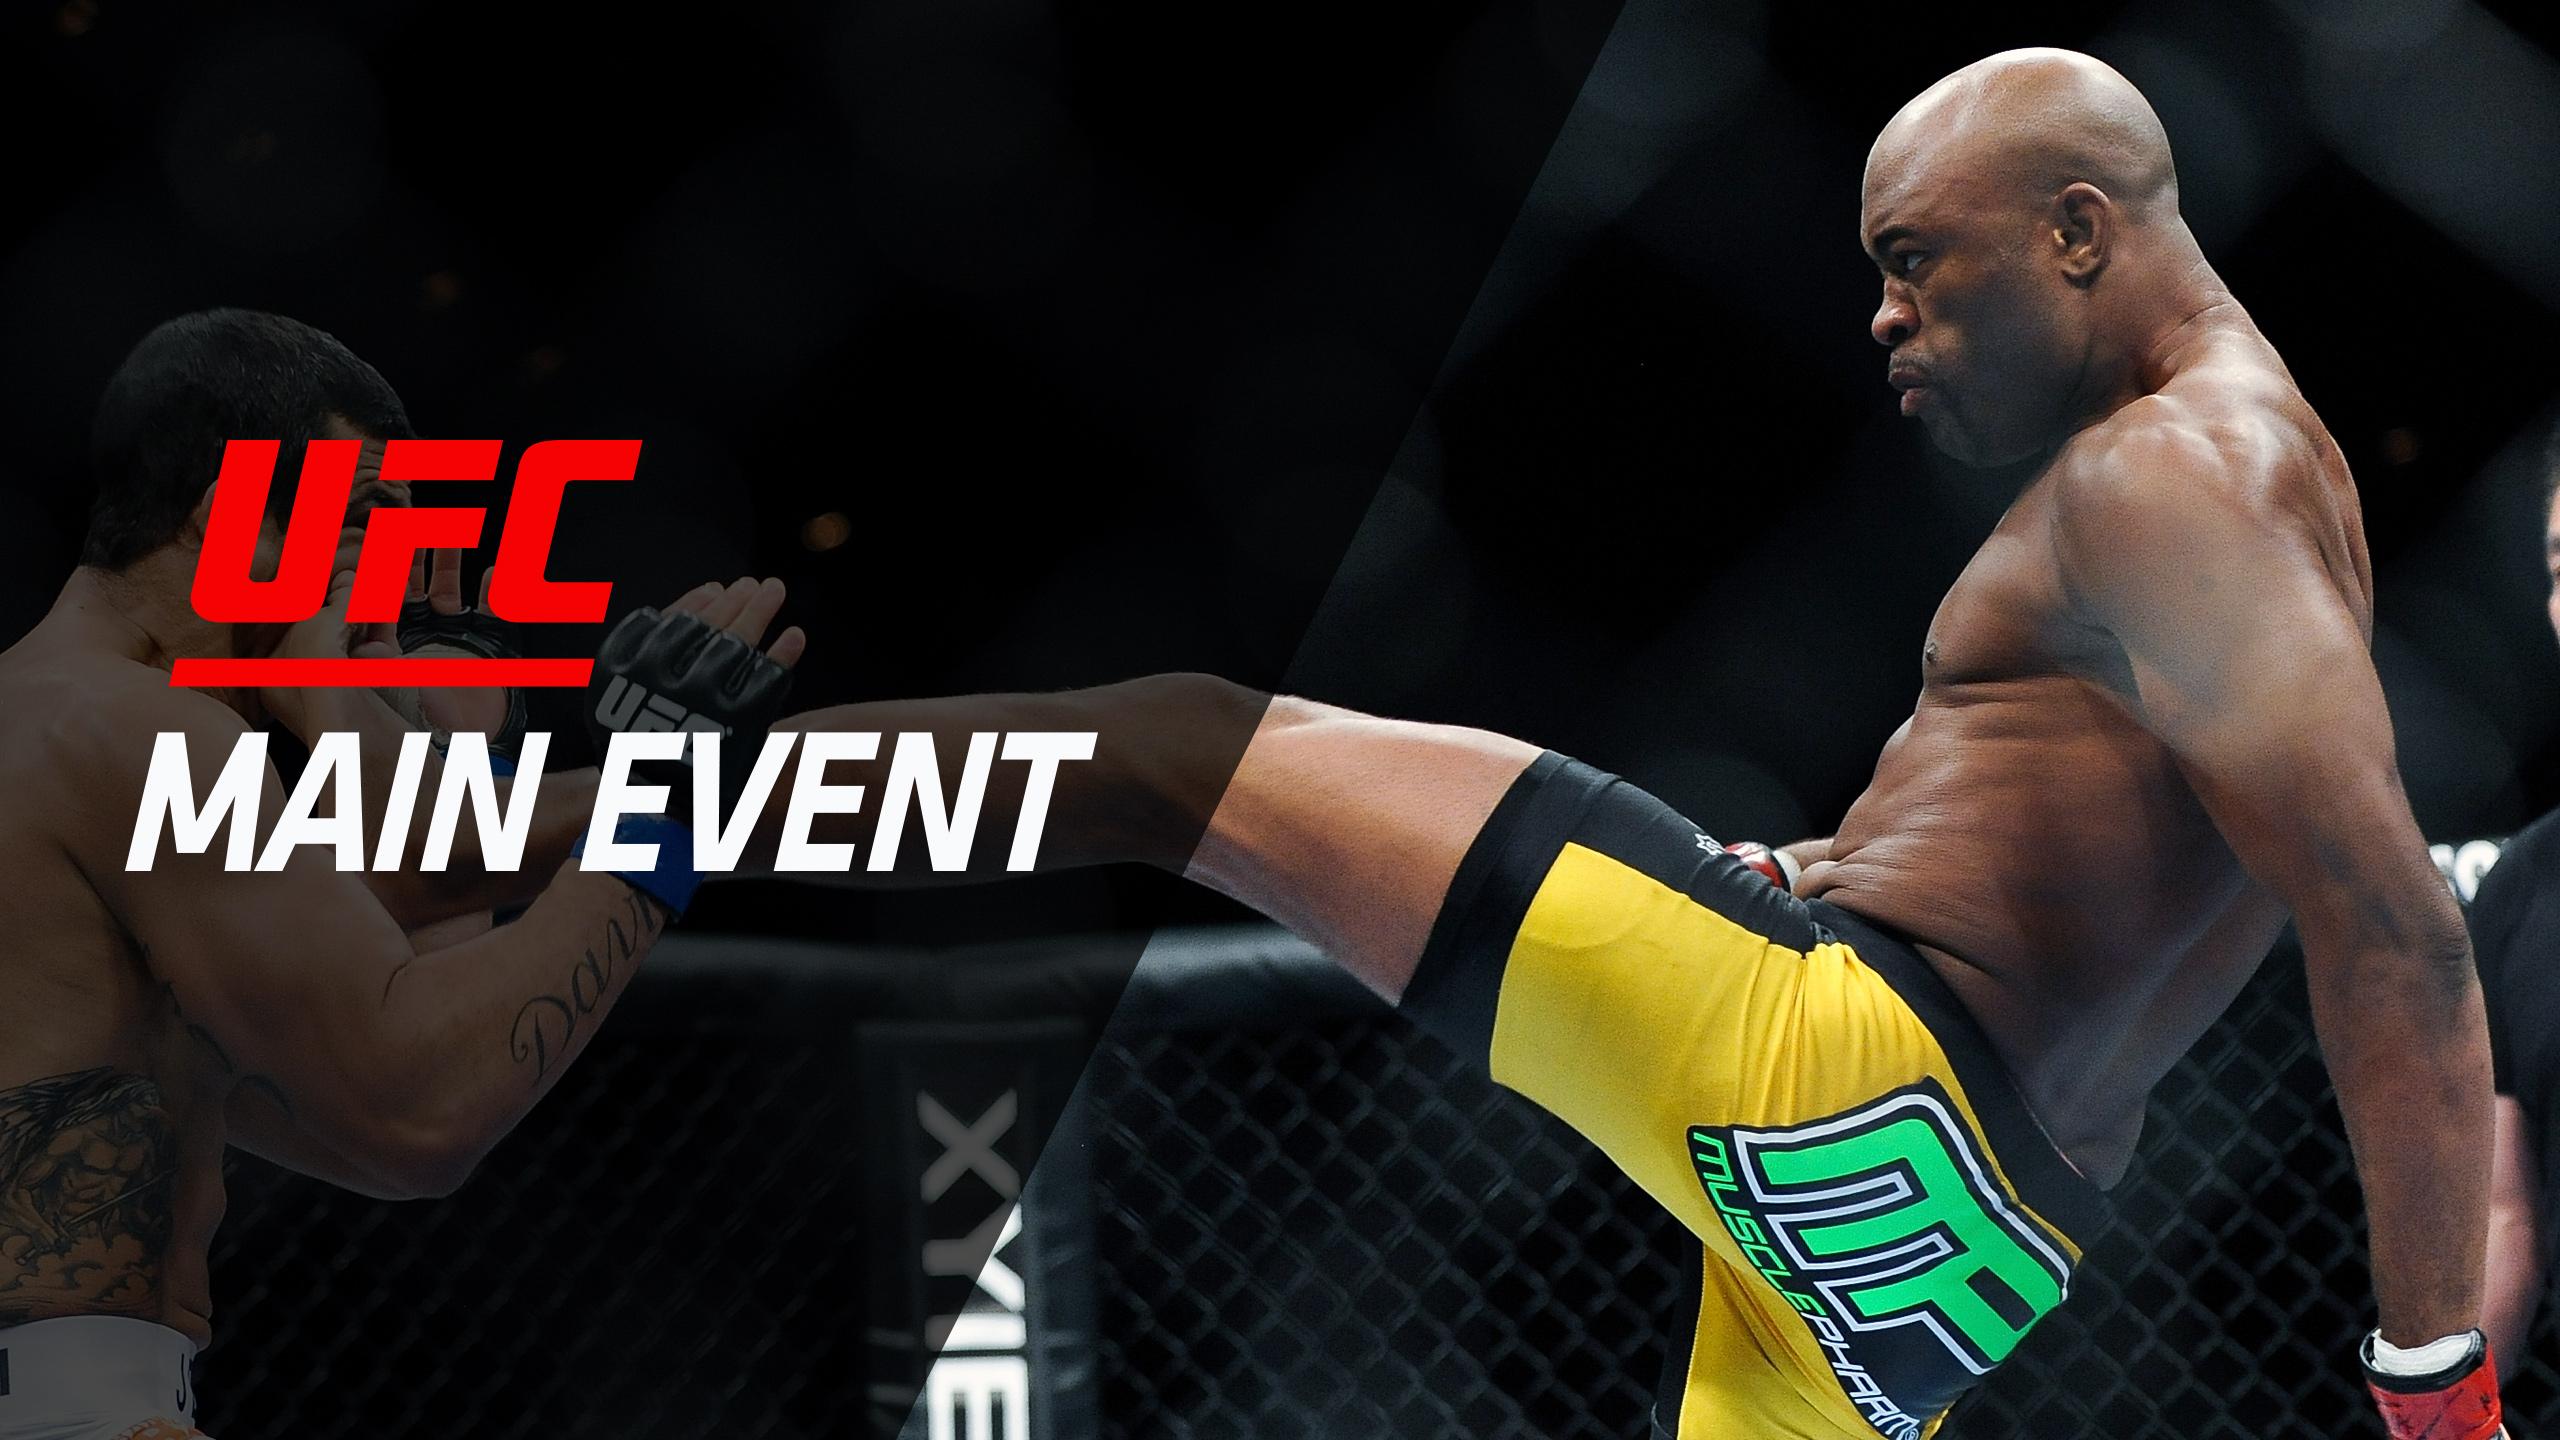 UFC Main Event: Silva vs. Belfort